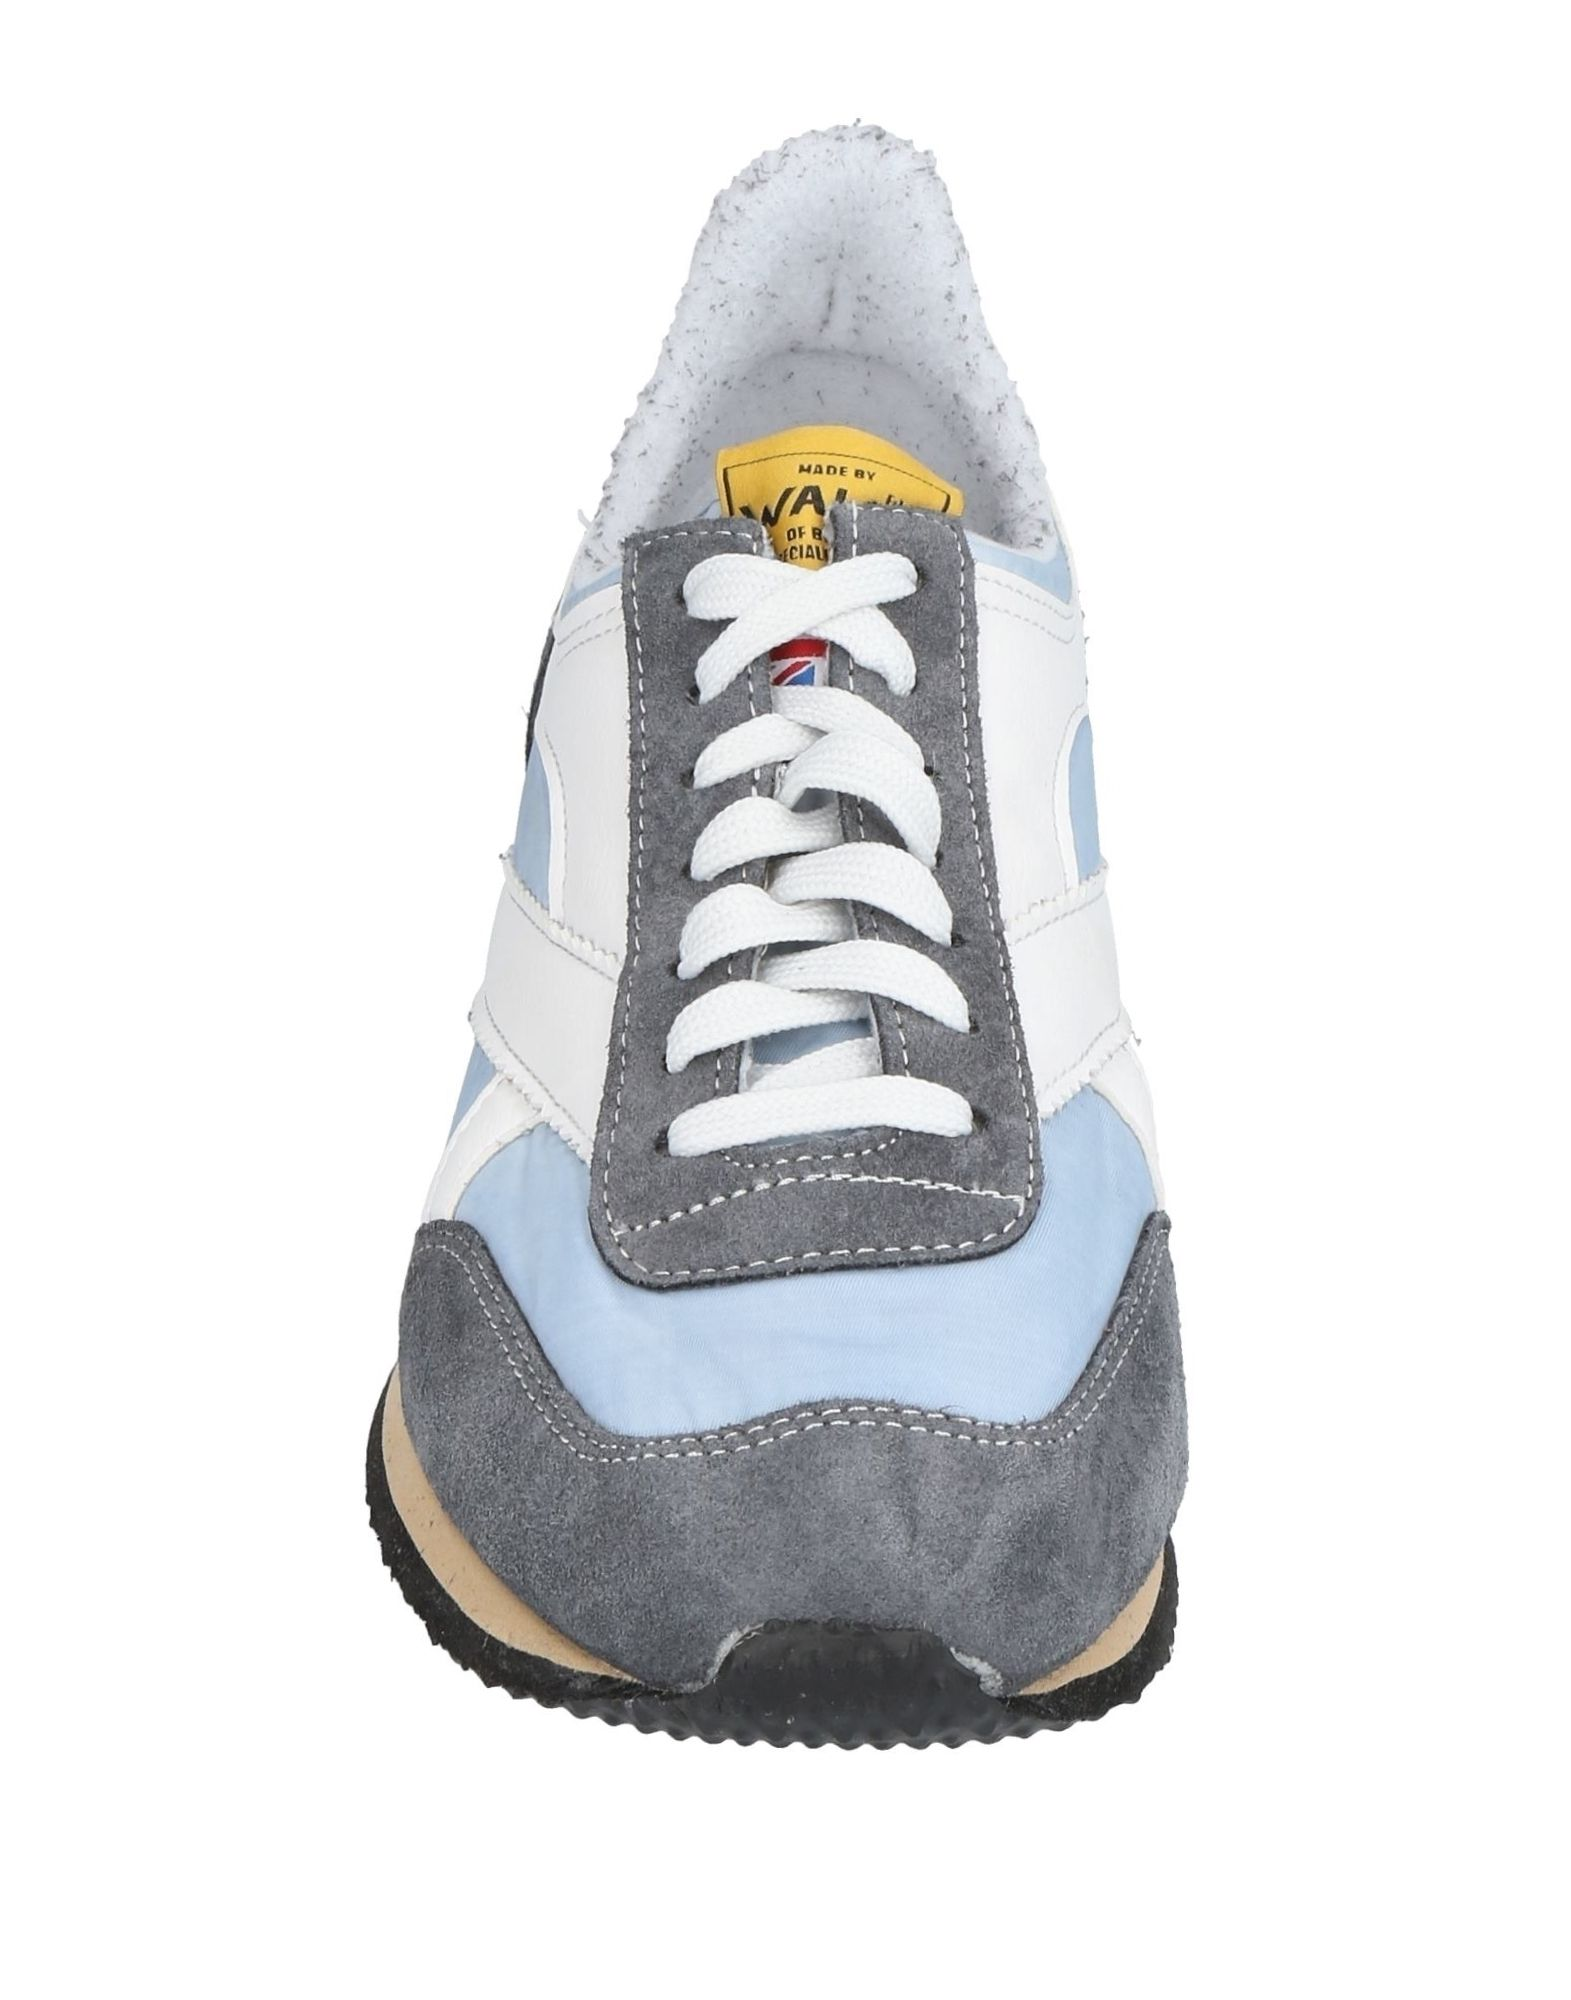 11422623GC Walsh Sneakers Herren  11422623GC  Heiße Schuhe 601d9e